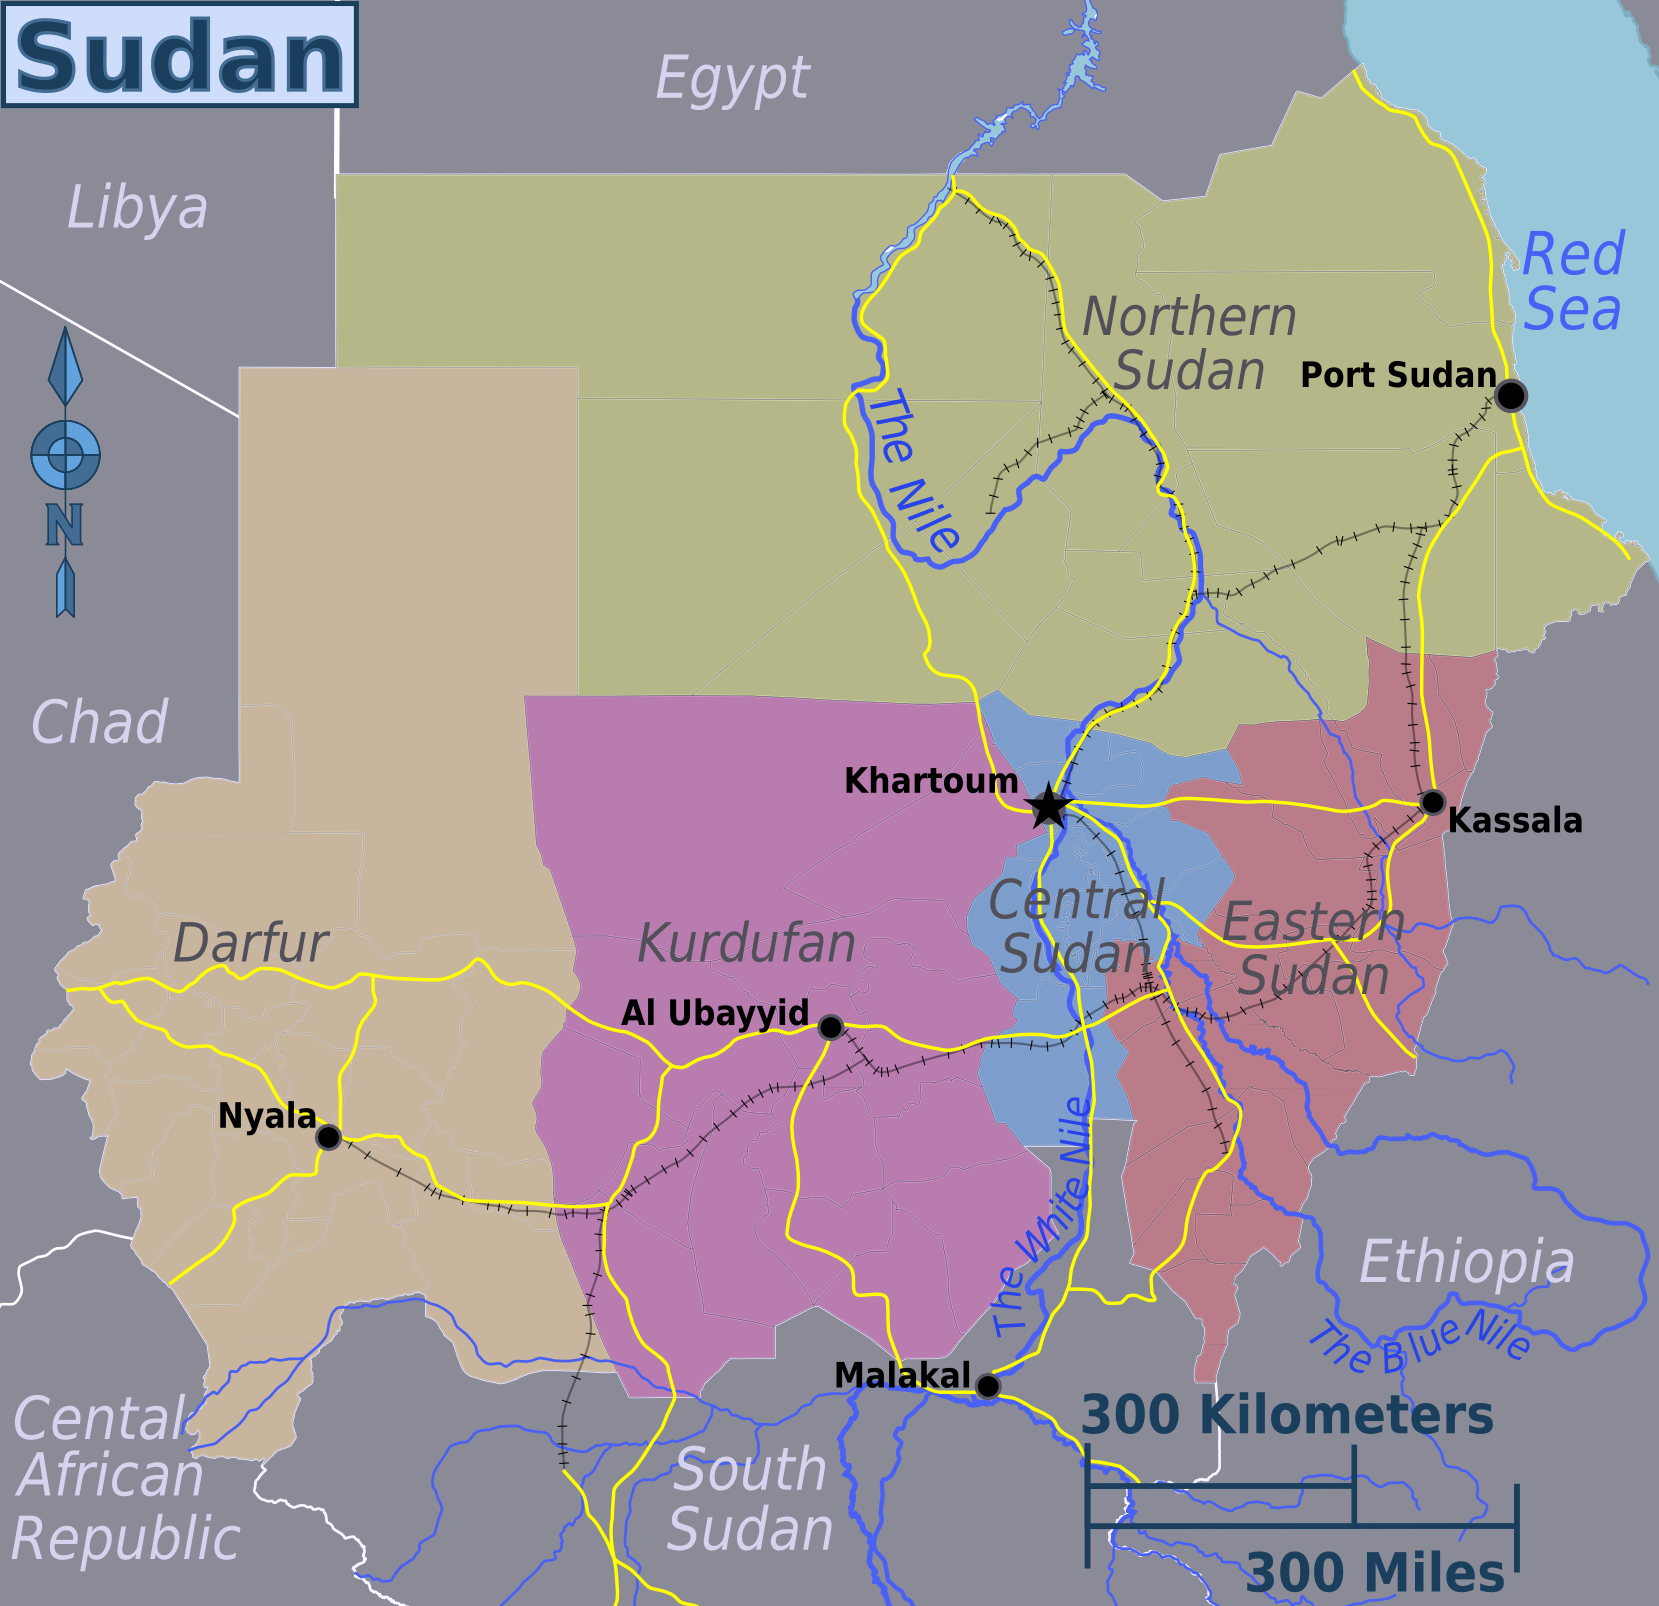 Sudan detailed provinces map Detailed provinces map of Sudan